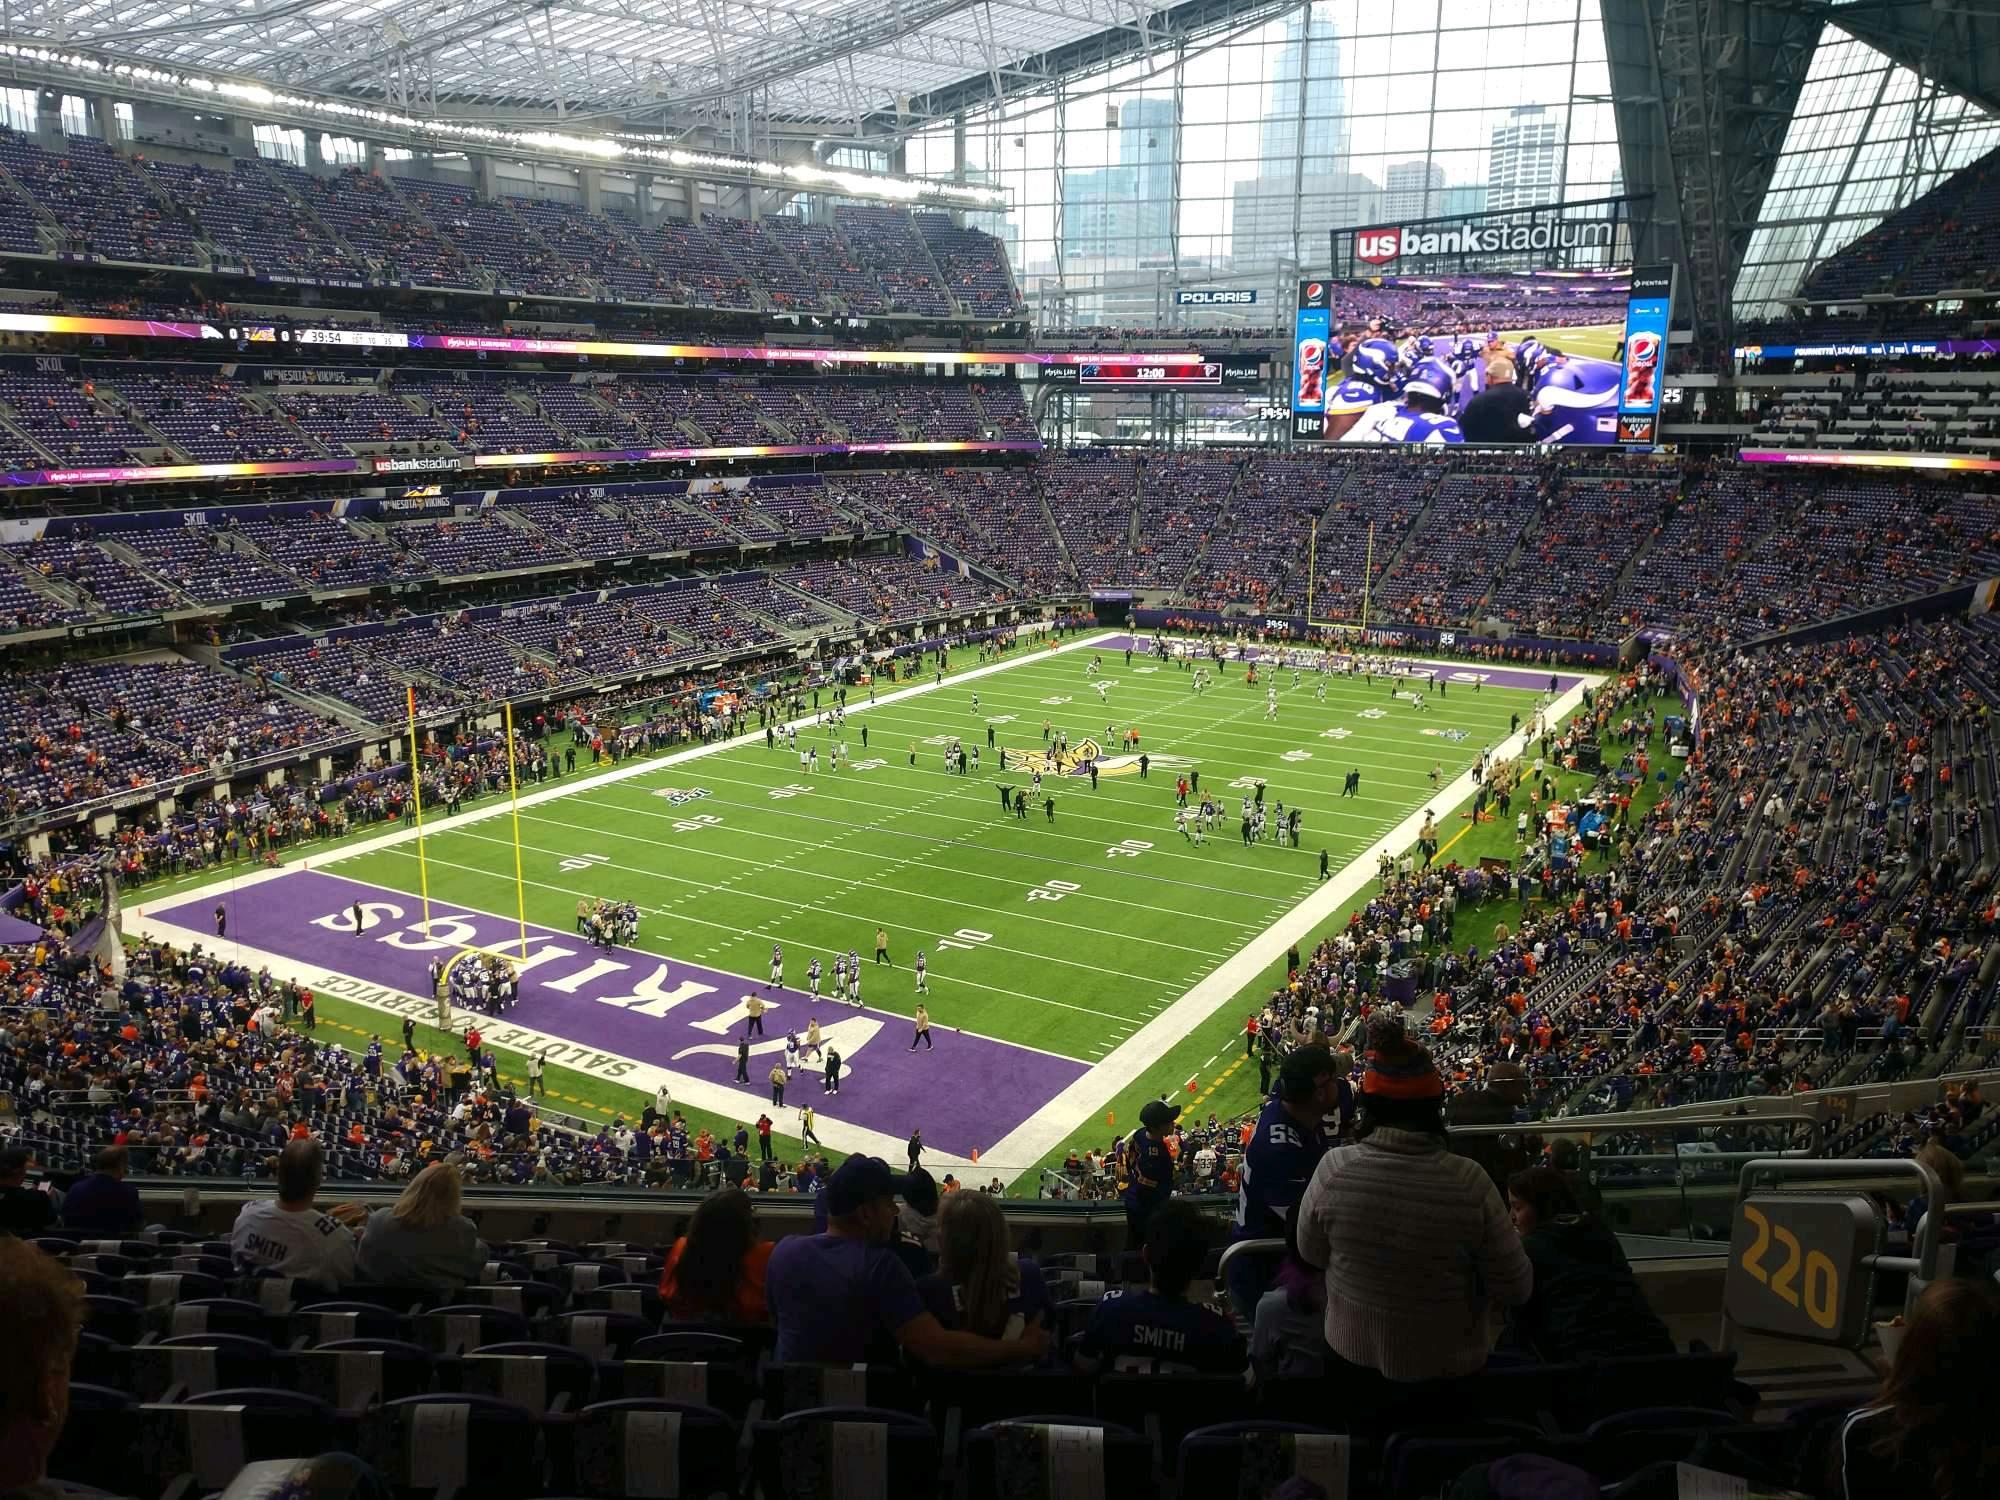 U.S. Bank Stadium Section 220 Row 11 Seat 6